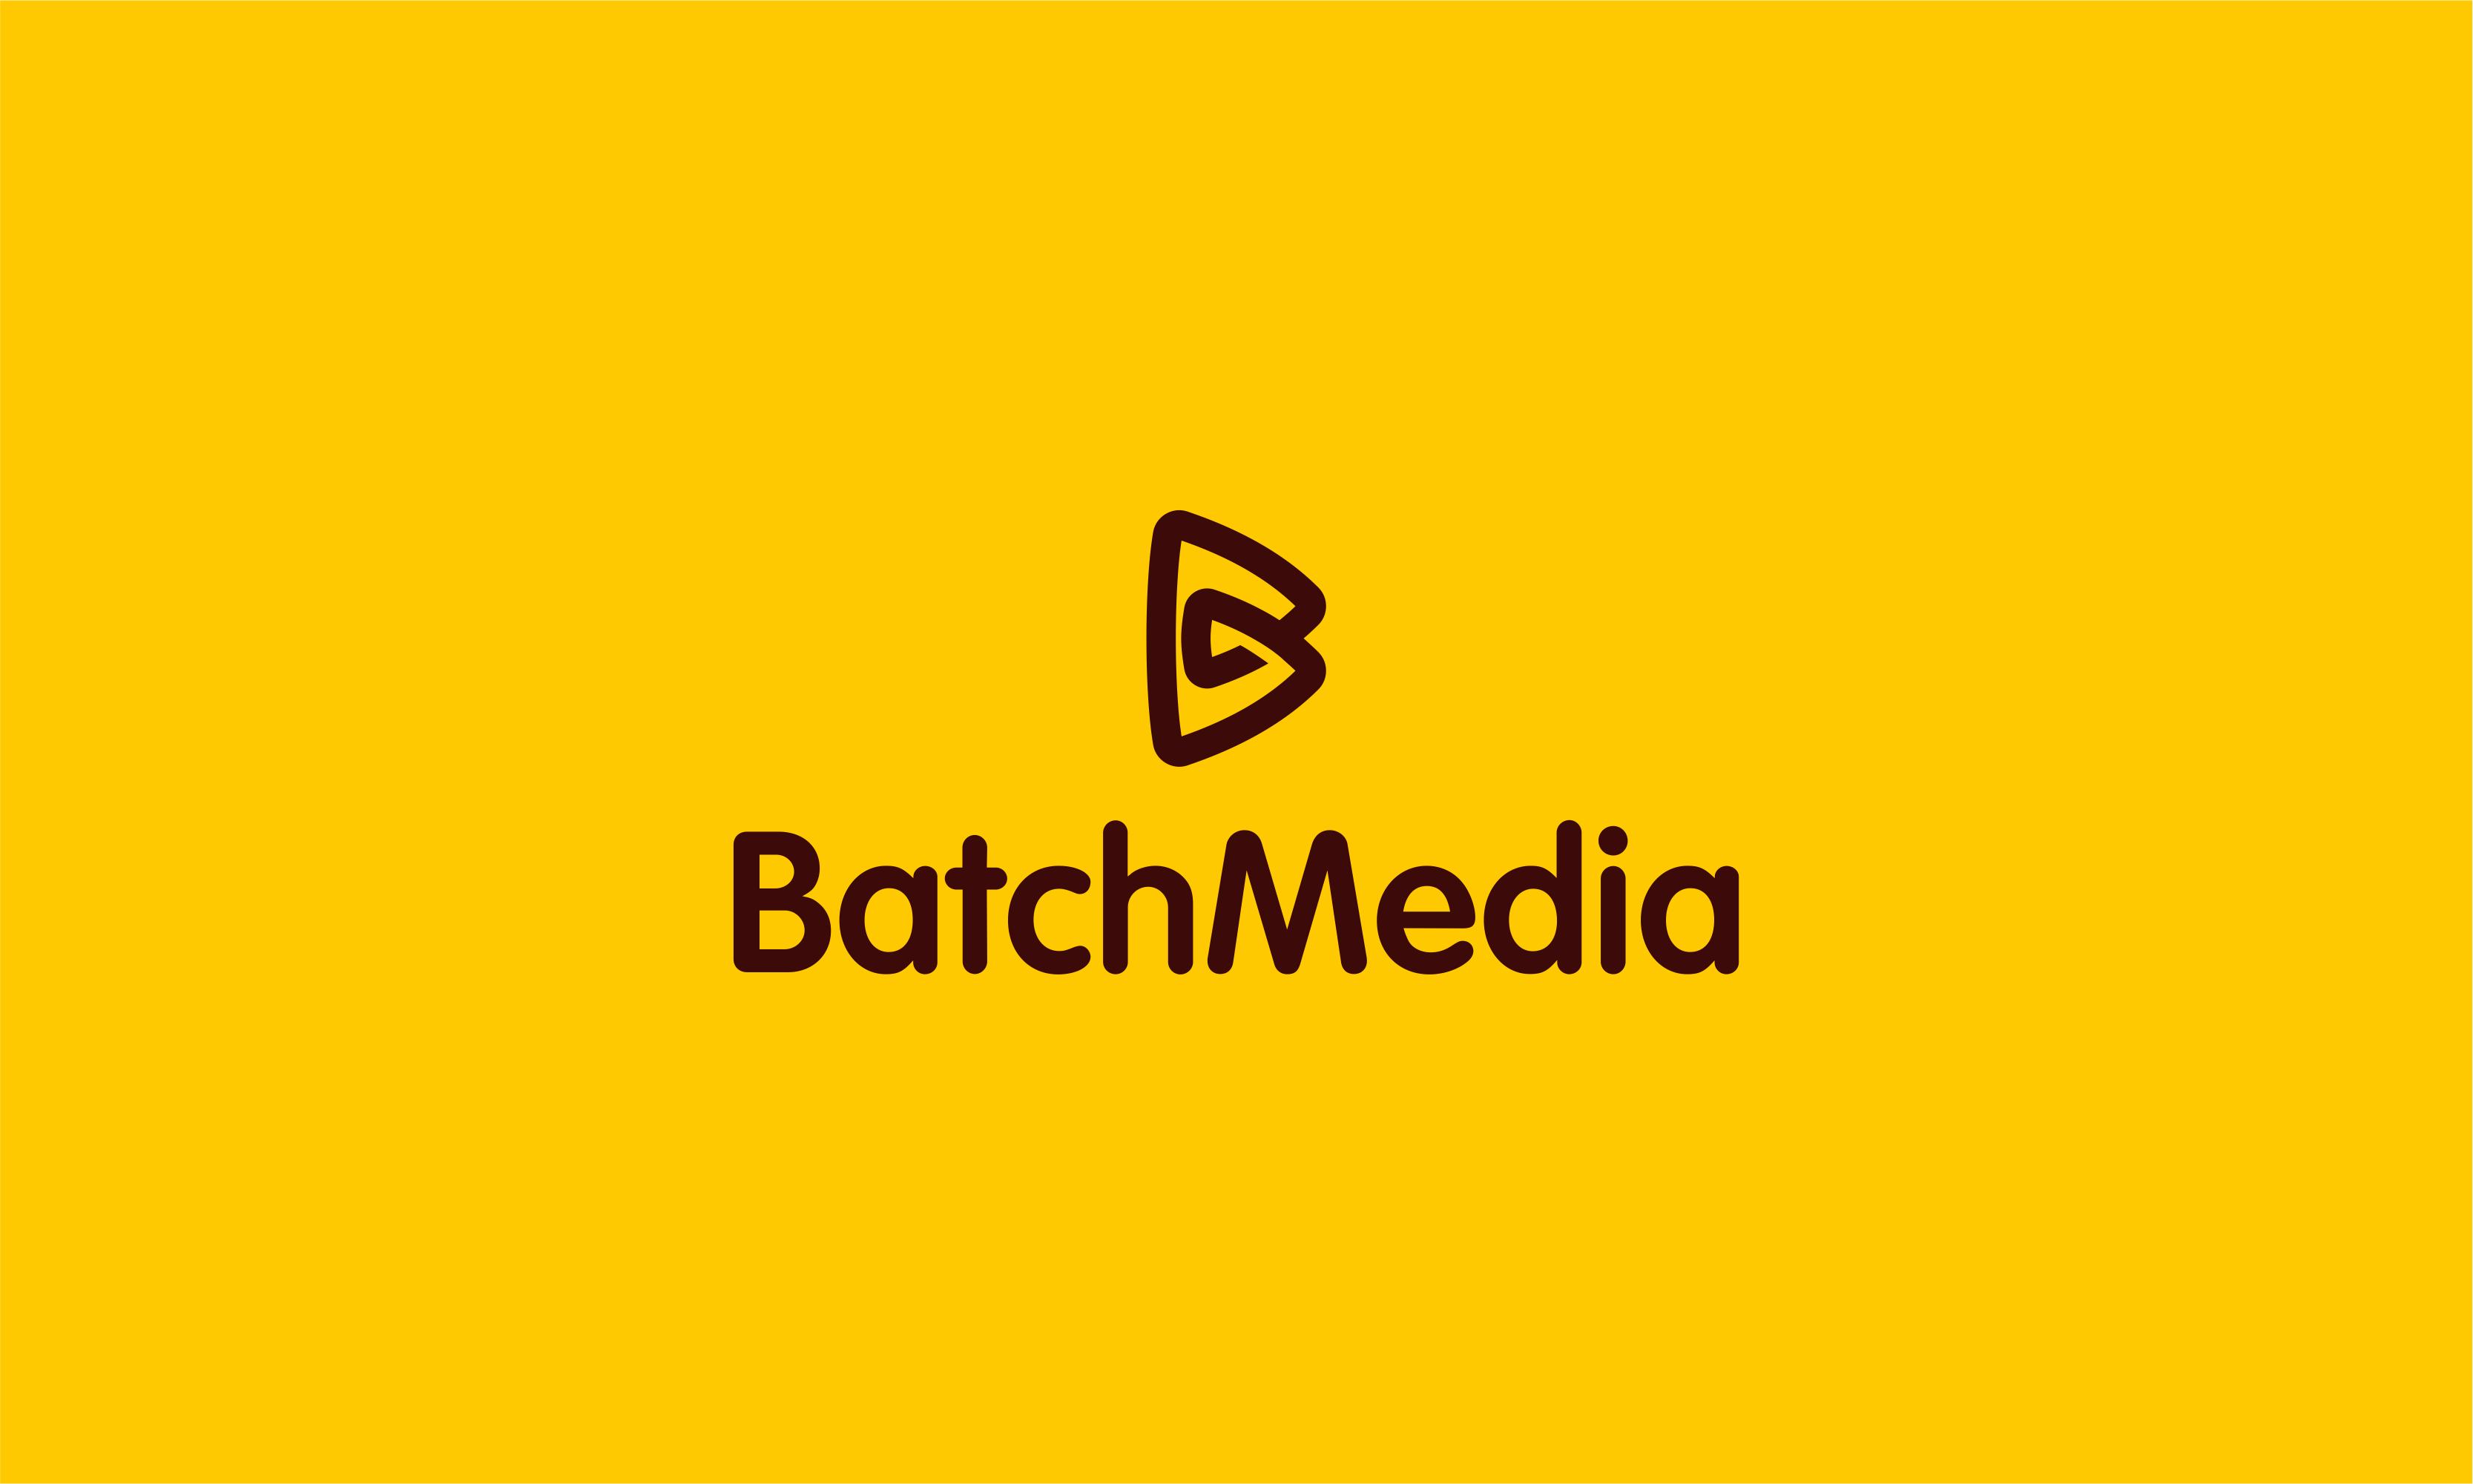 Batchmedia